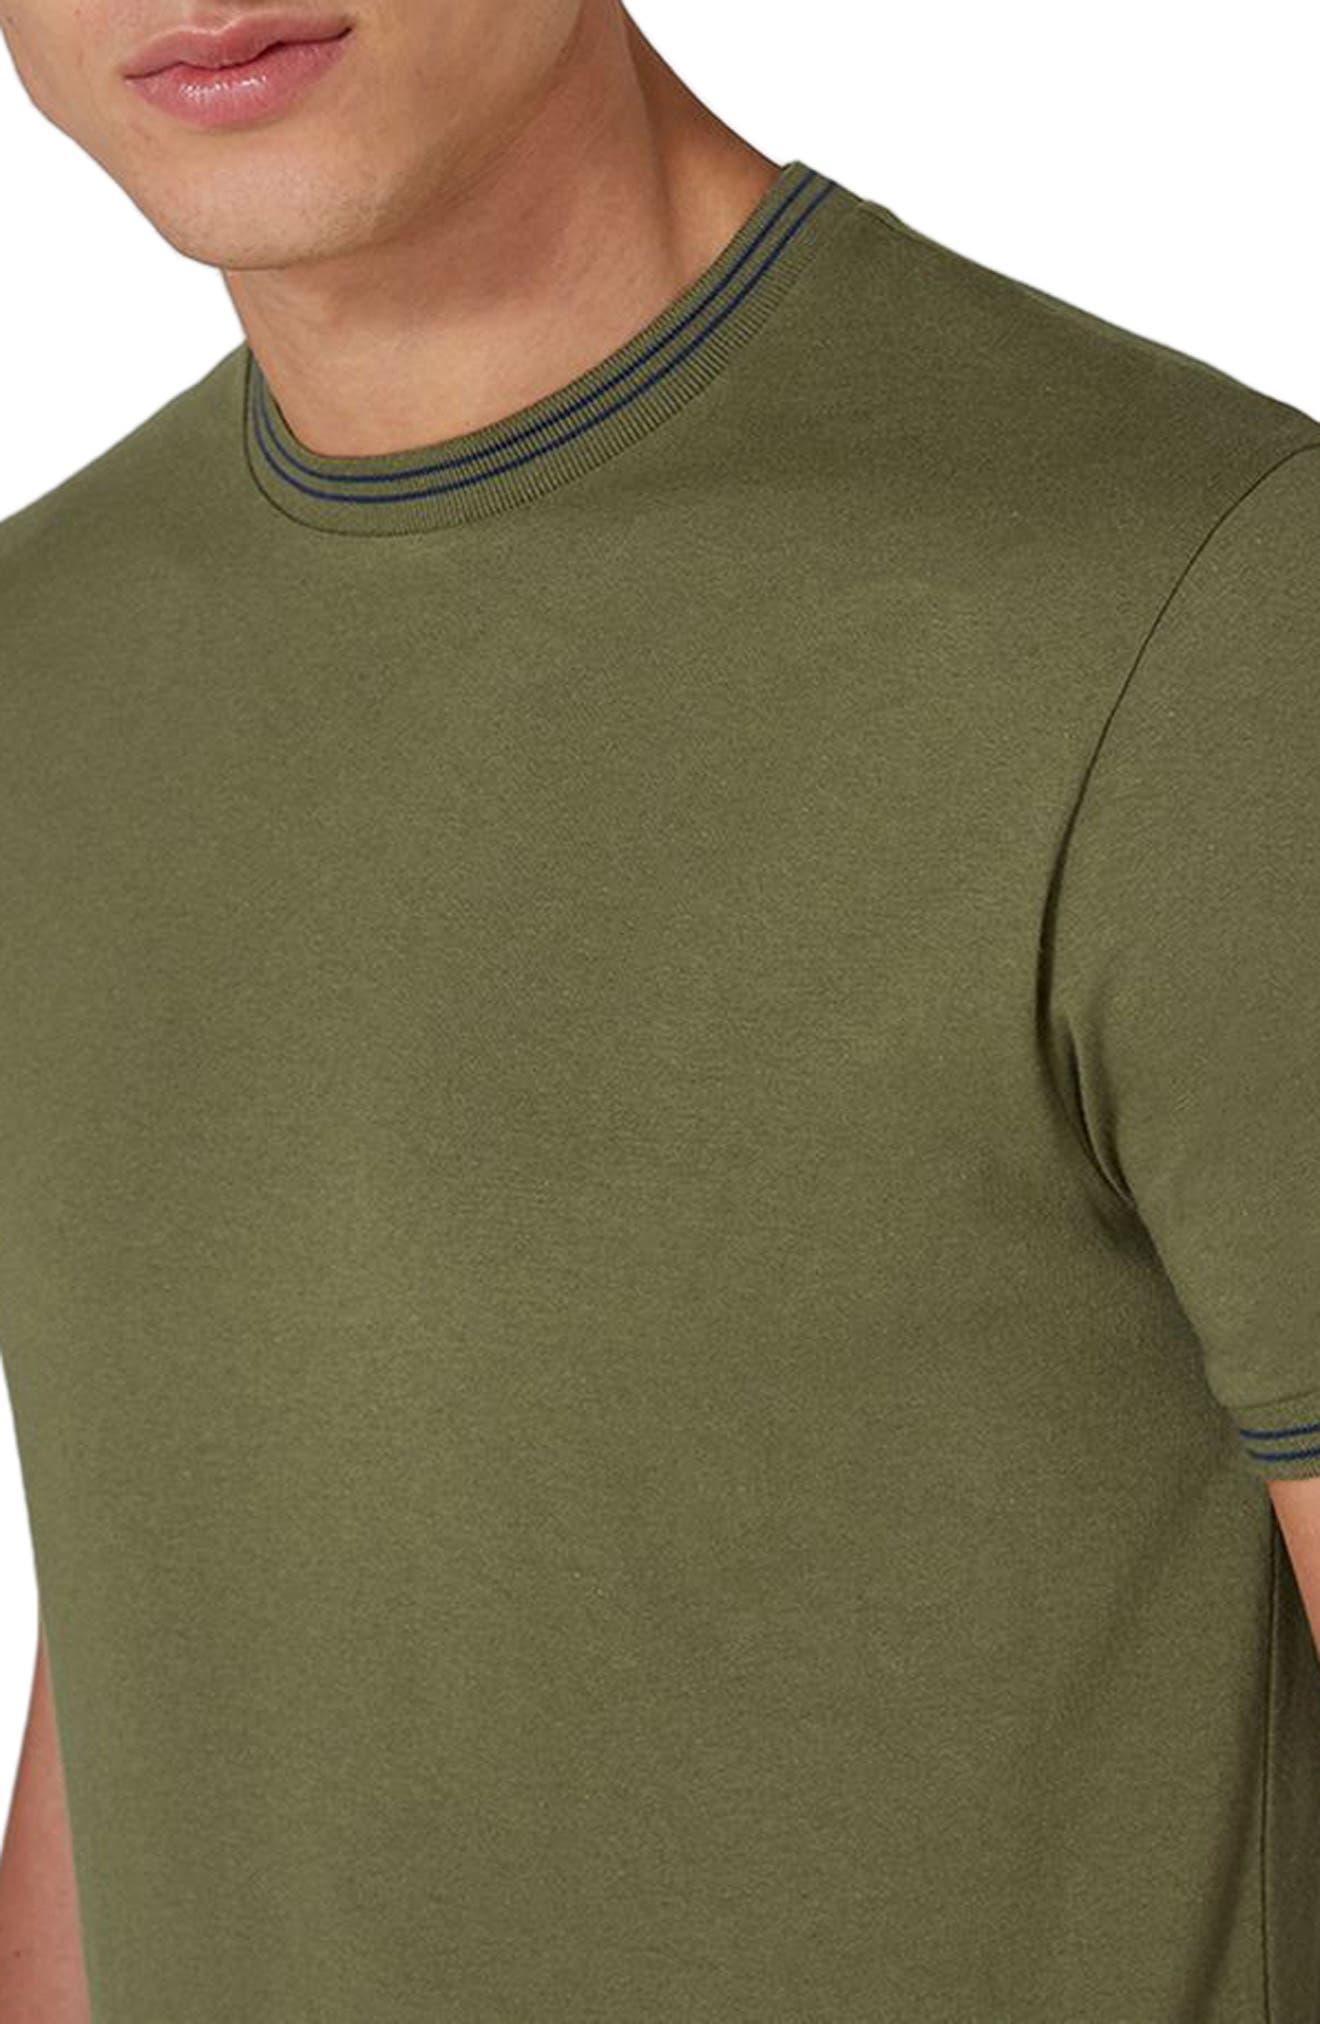 Stripe Muscle T-Shirt,                             Alternate thumbnail 3, color,                             300